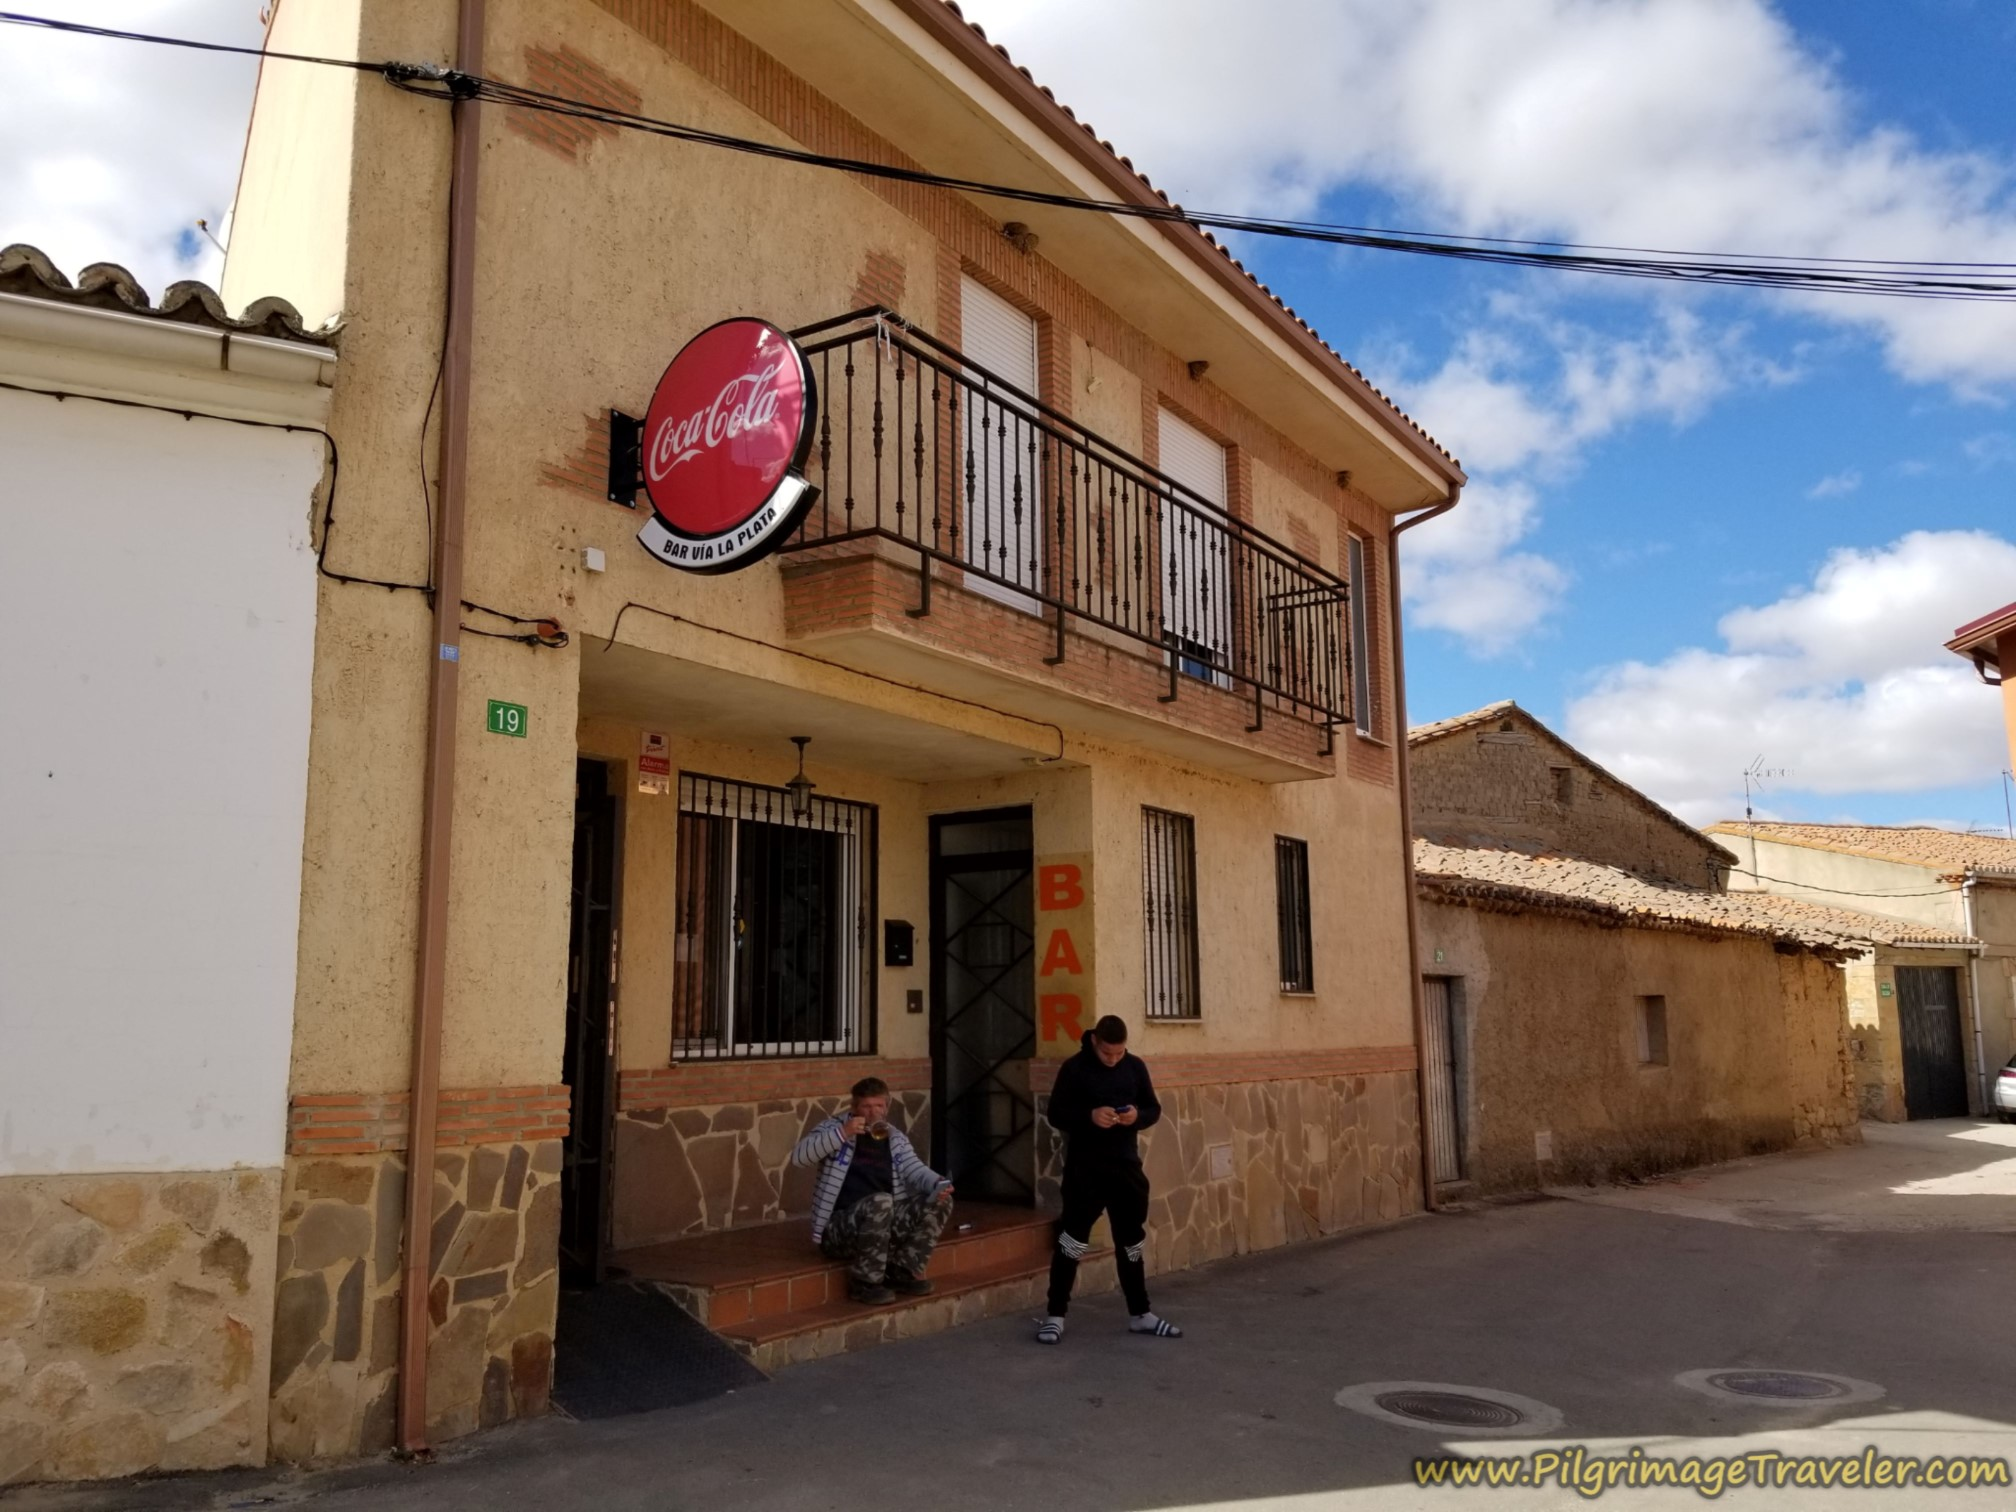 Café Bar Vía de la Plata, at day's end on the Vía de la Plata from Cañedino to Villanueva de Campeán